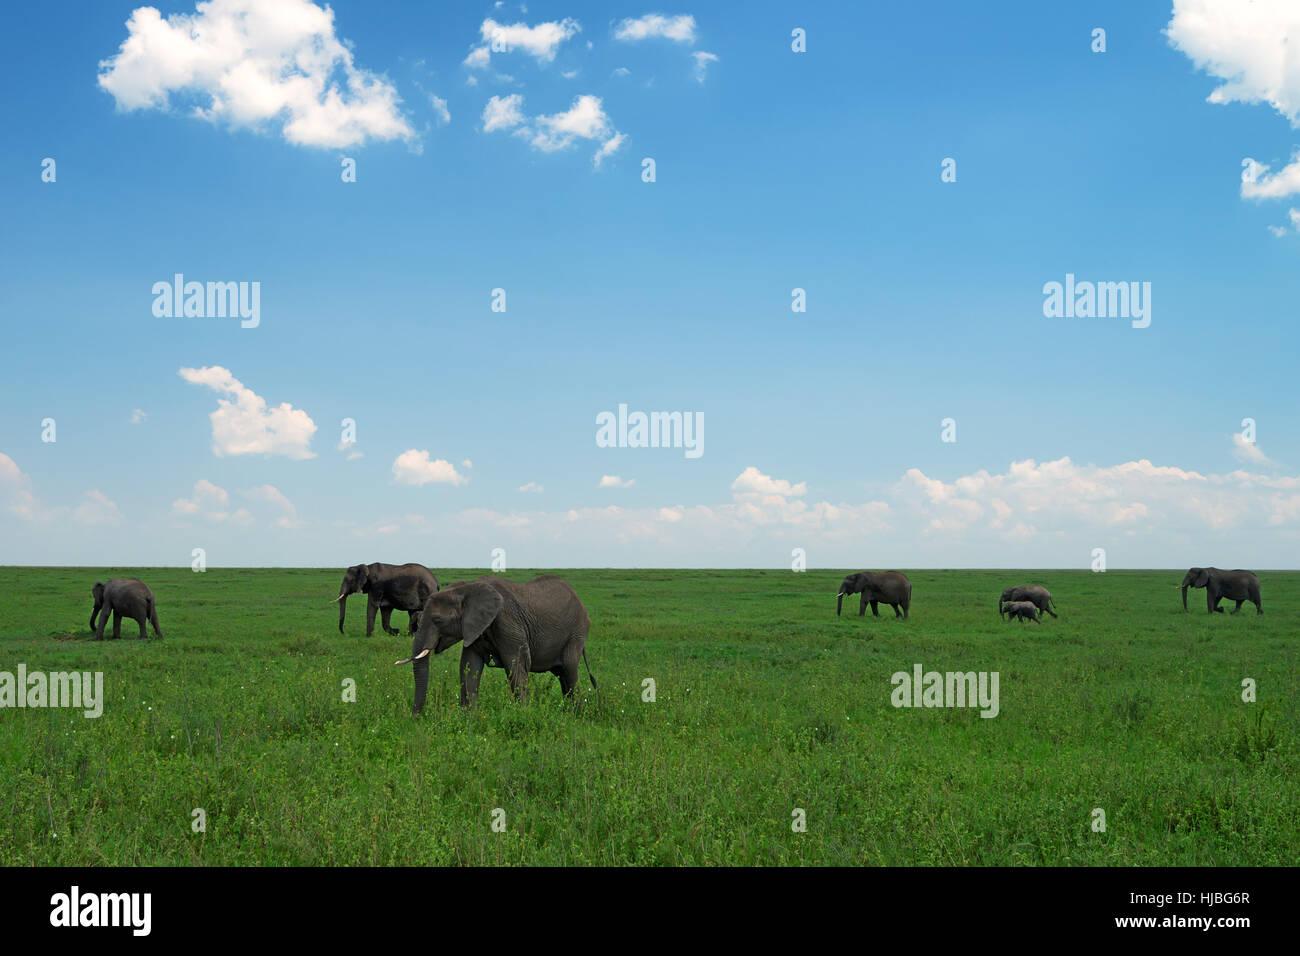 Gruppo di elefanti africani nella savana Immagini Stock